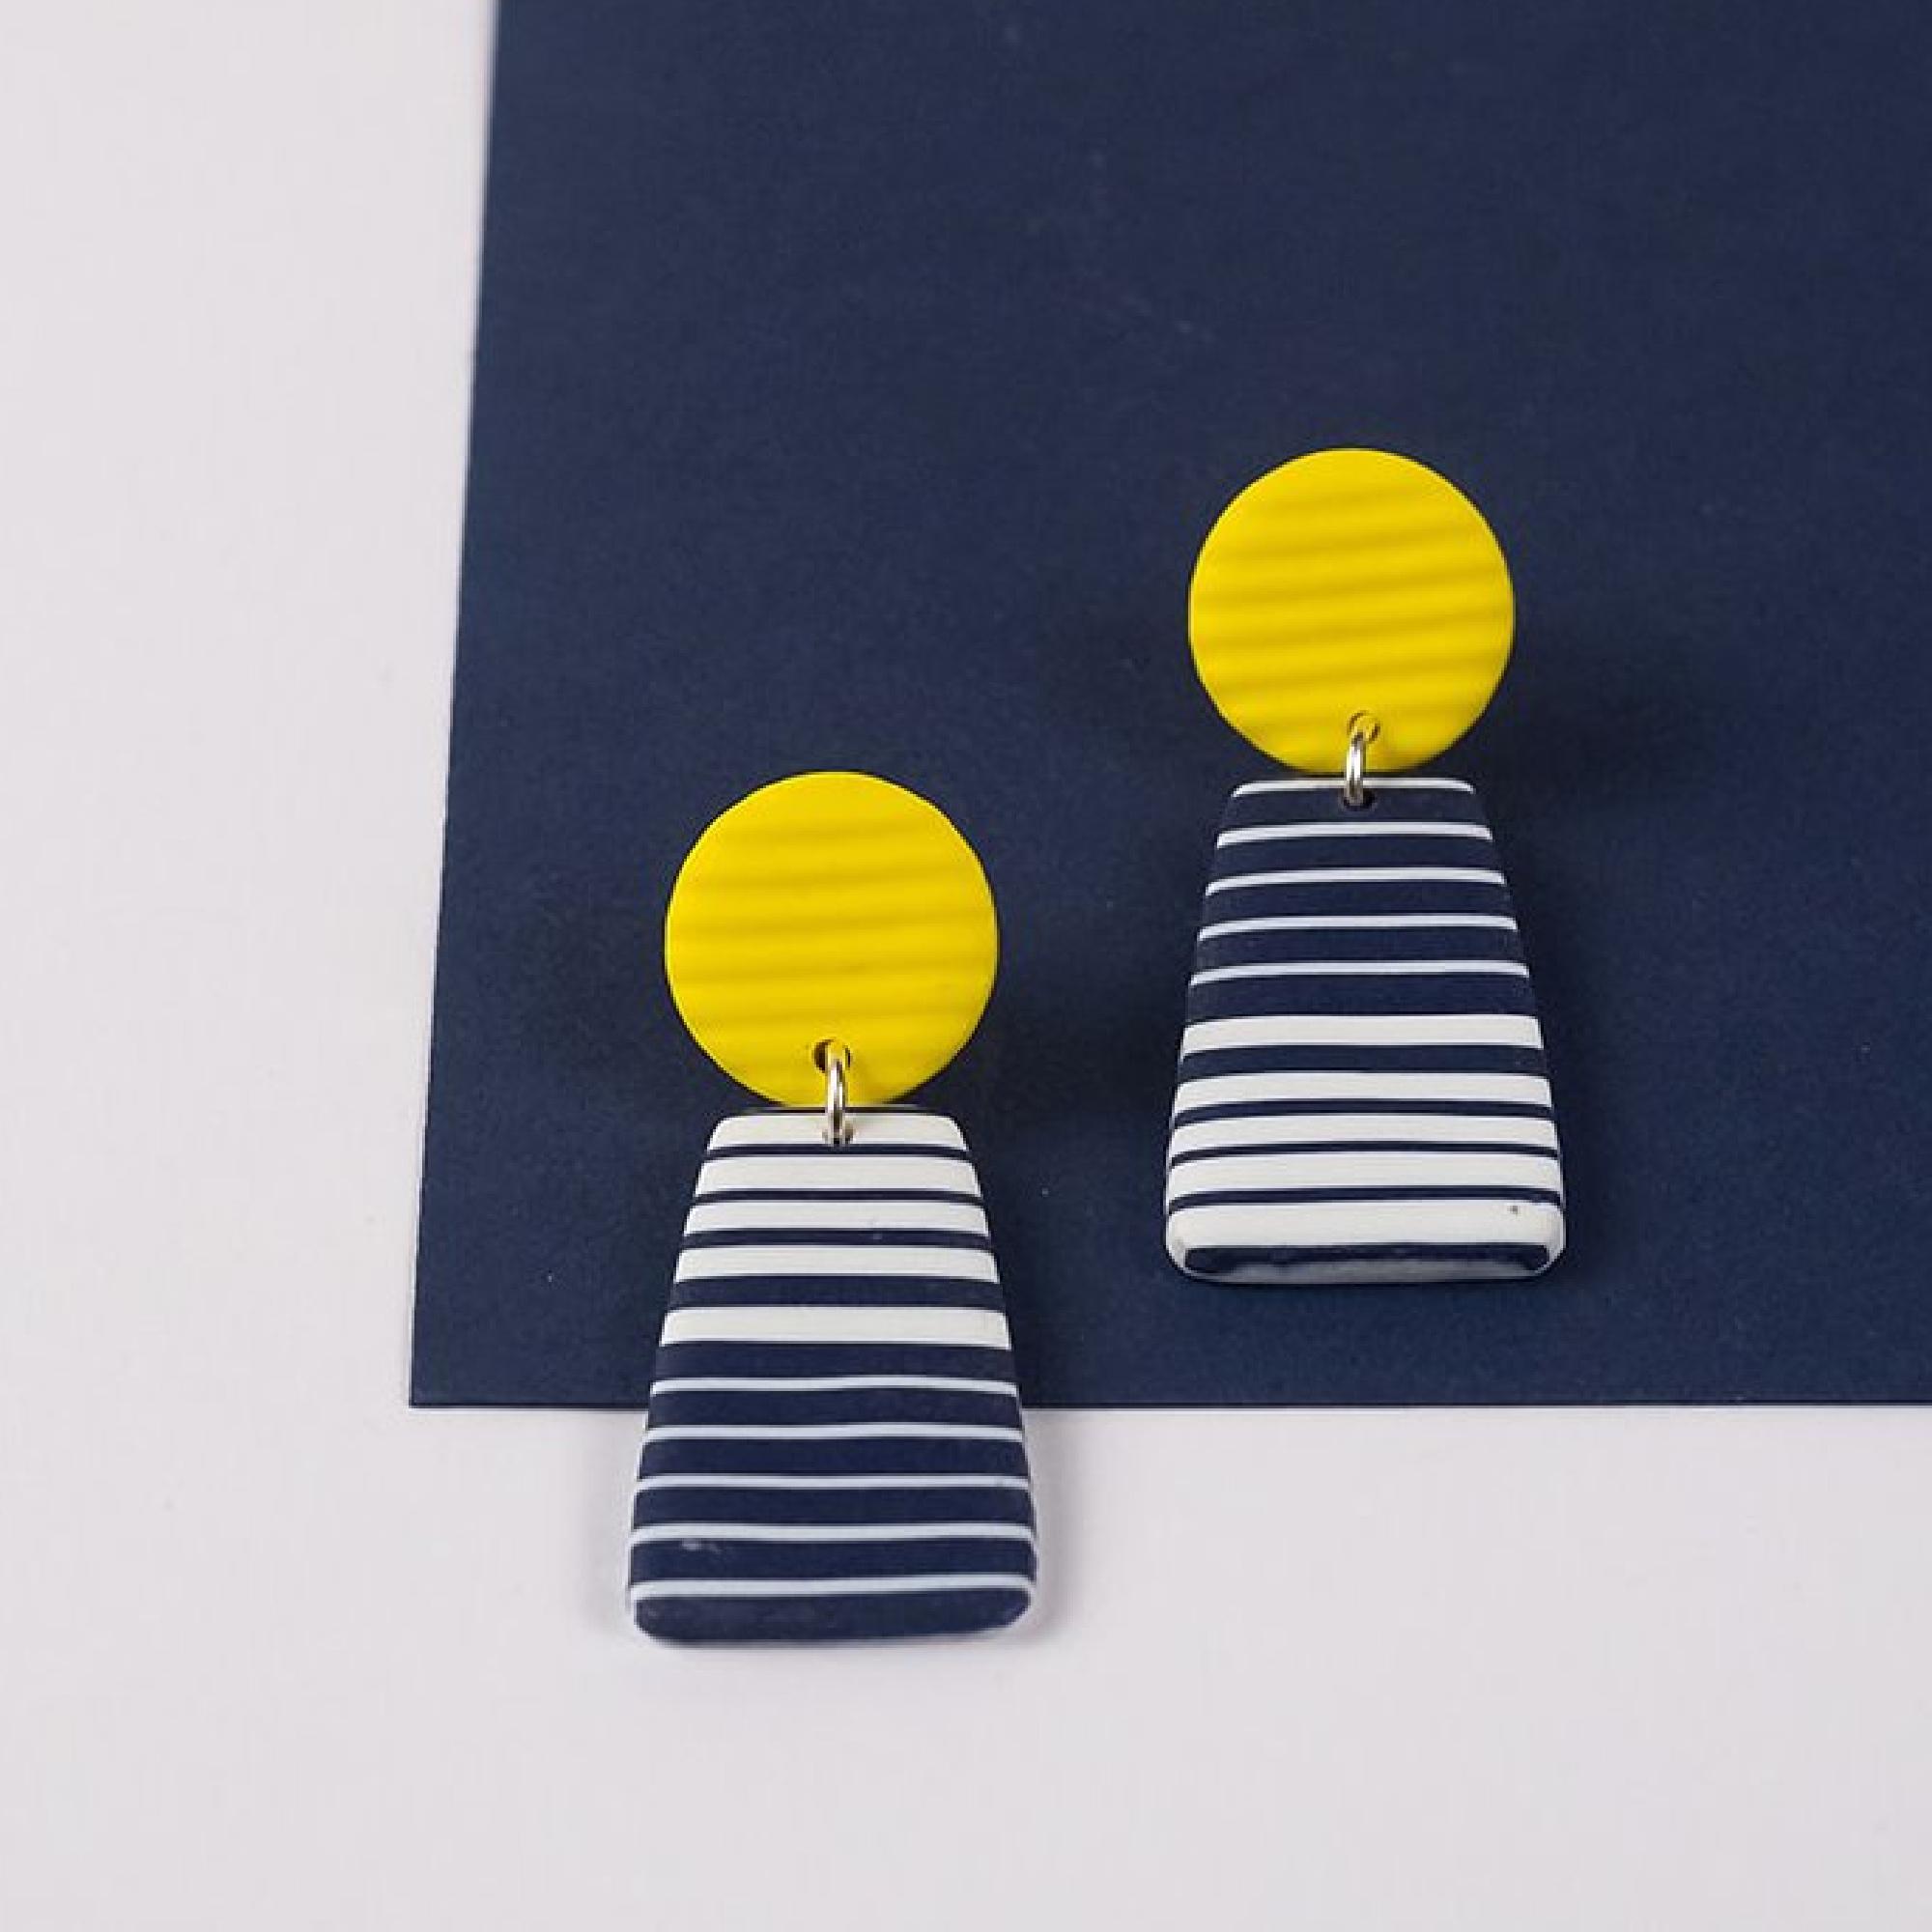 Carnac Breton Earrings by Nadege Honey